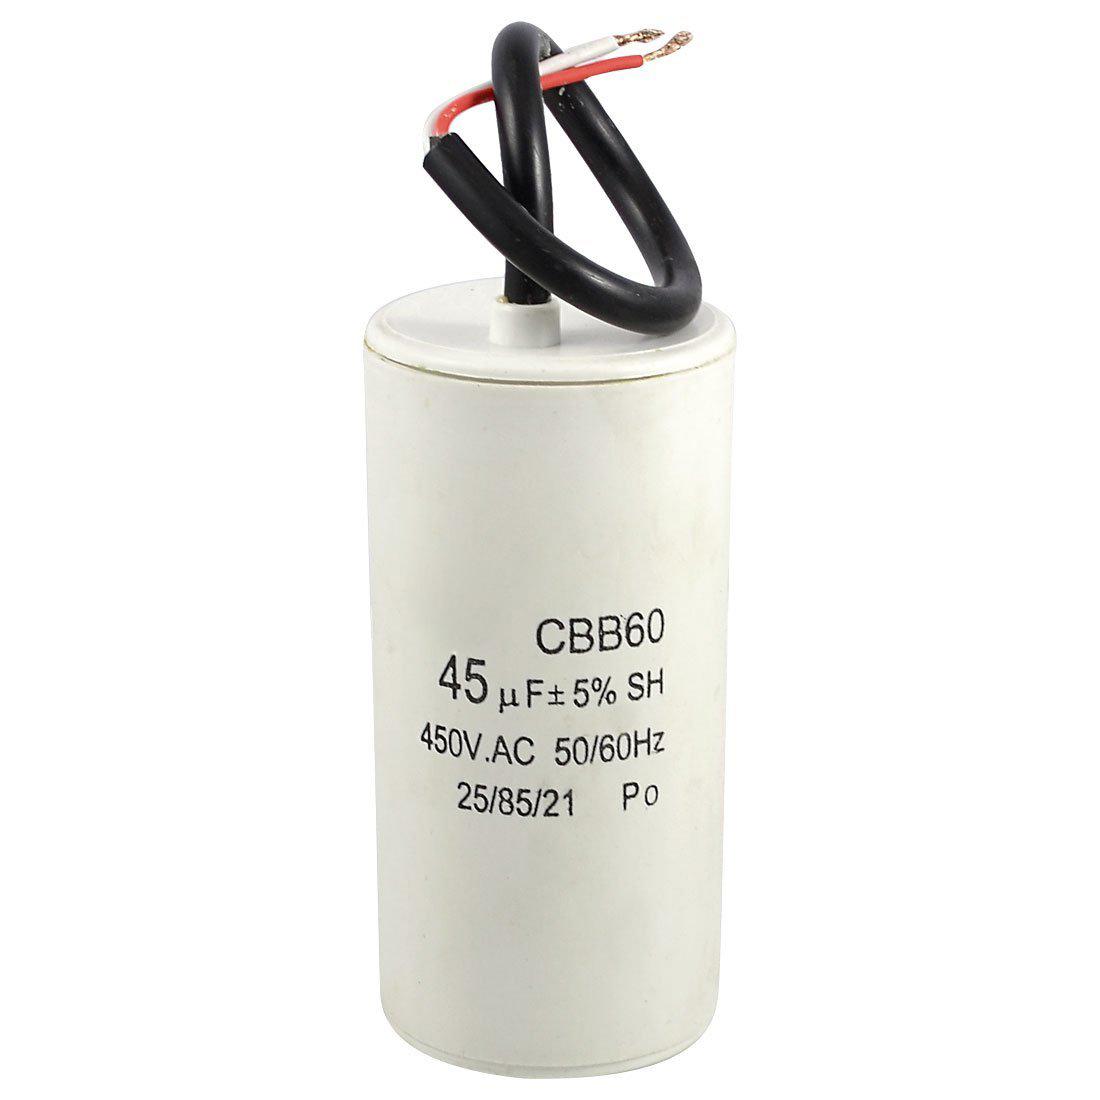 White Plastic Shell 45uf 50 60hz 450vac Cbb60 Motor Start